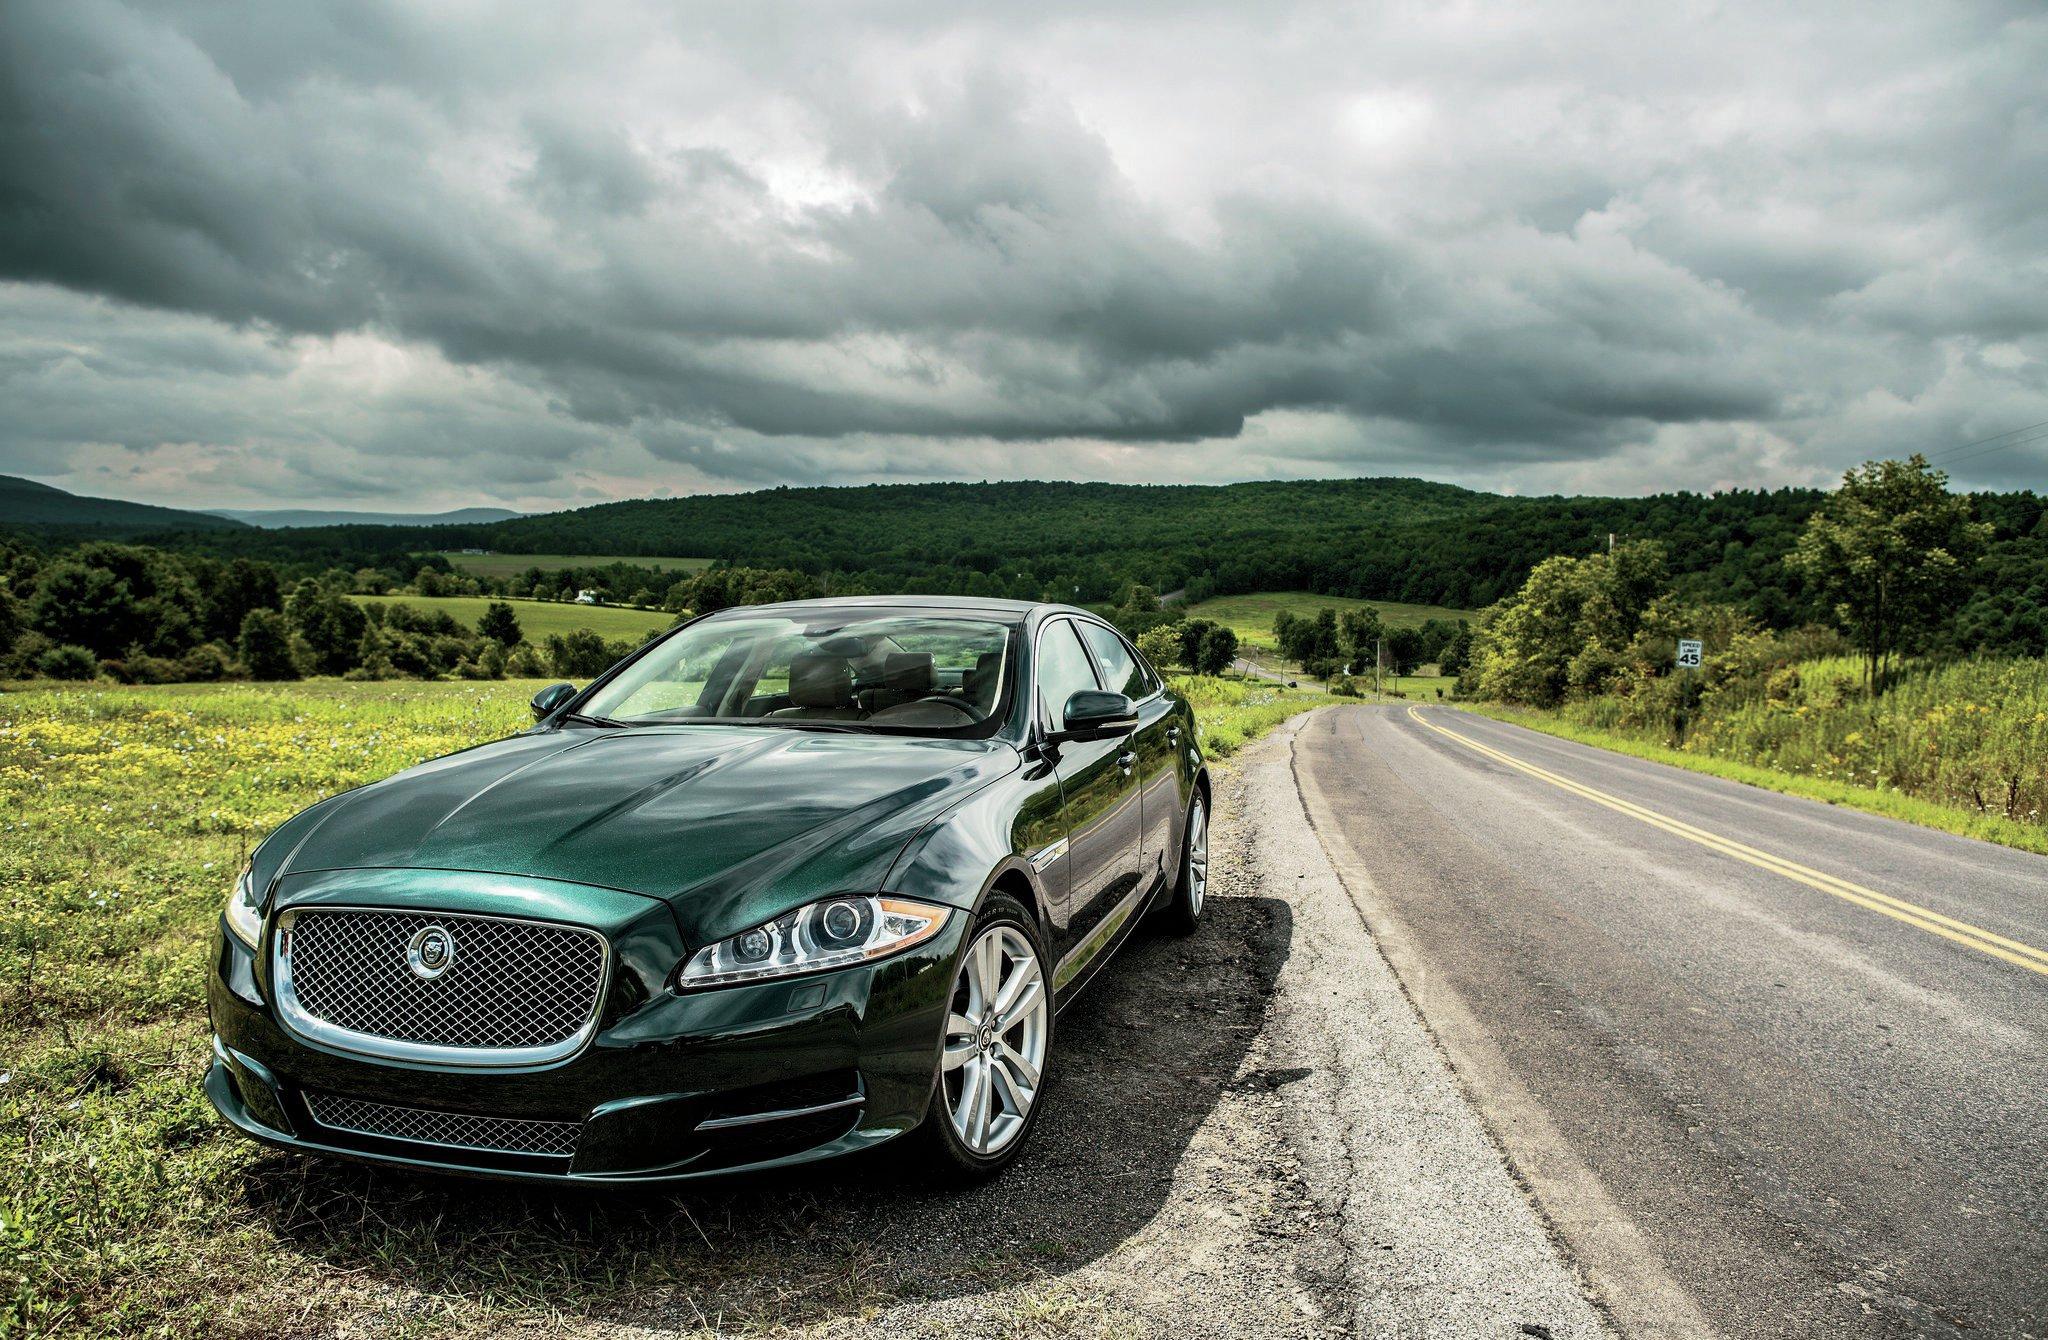 cars xj new lg hybrid photos news spy future caught testing jaguar xjl plug in